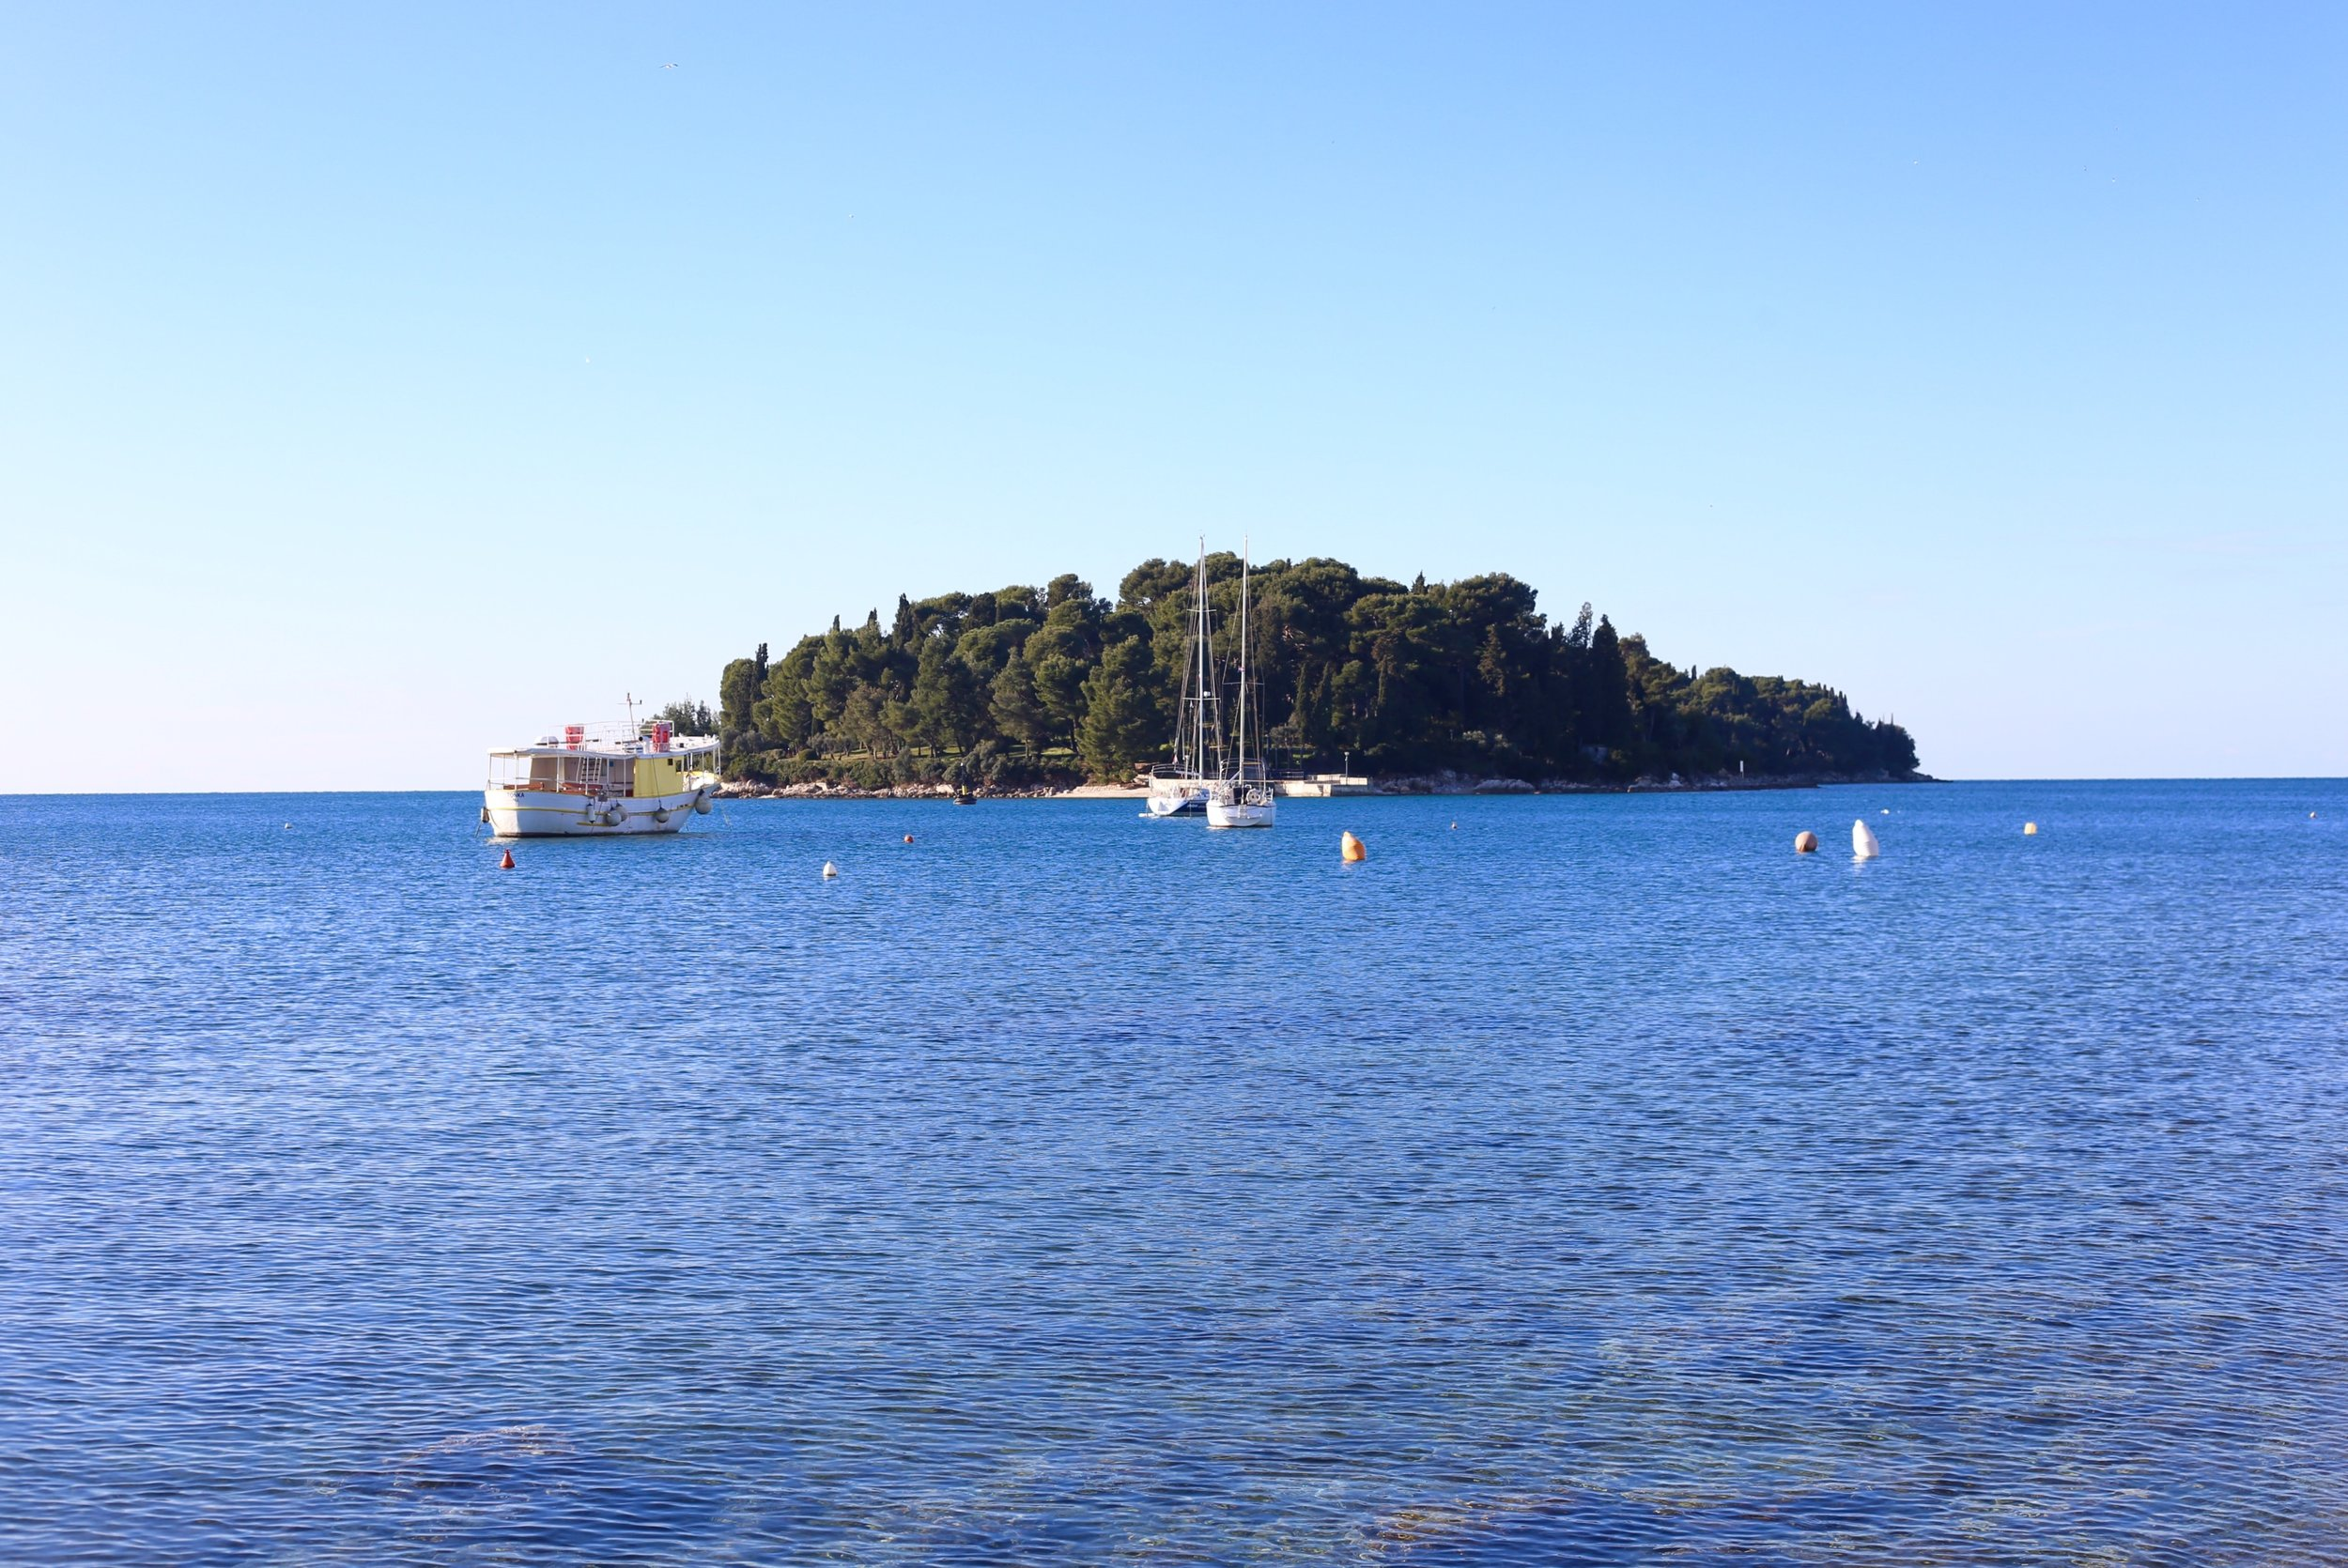 Tiny tree covered island off Croatia in the Adriatic sea.